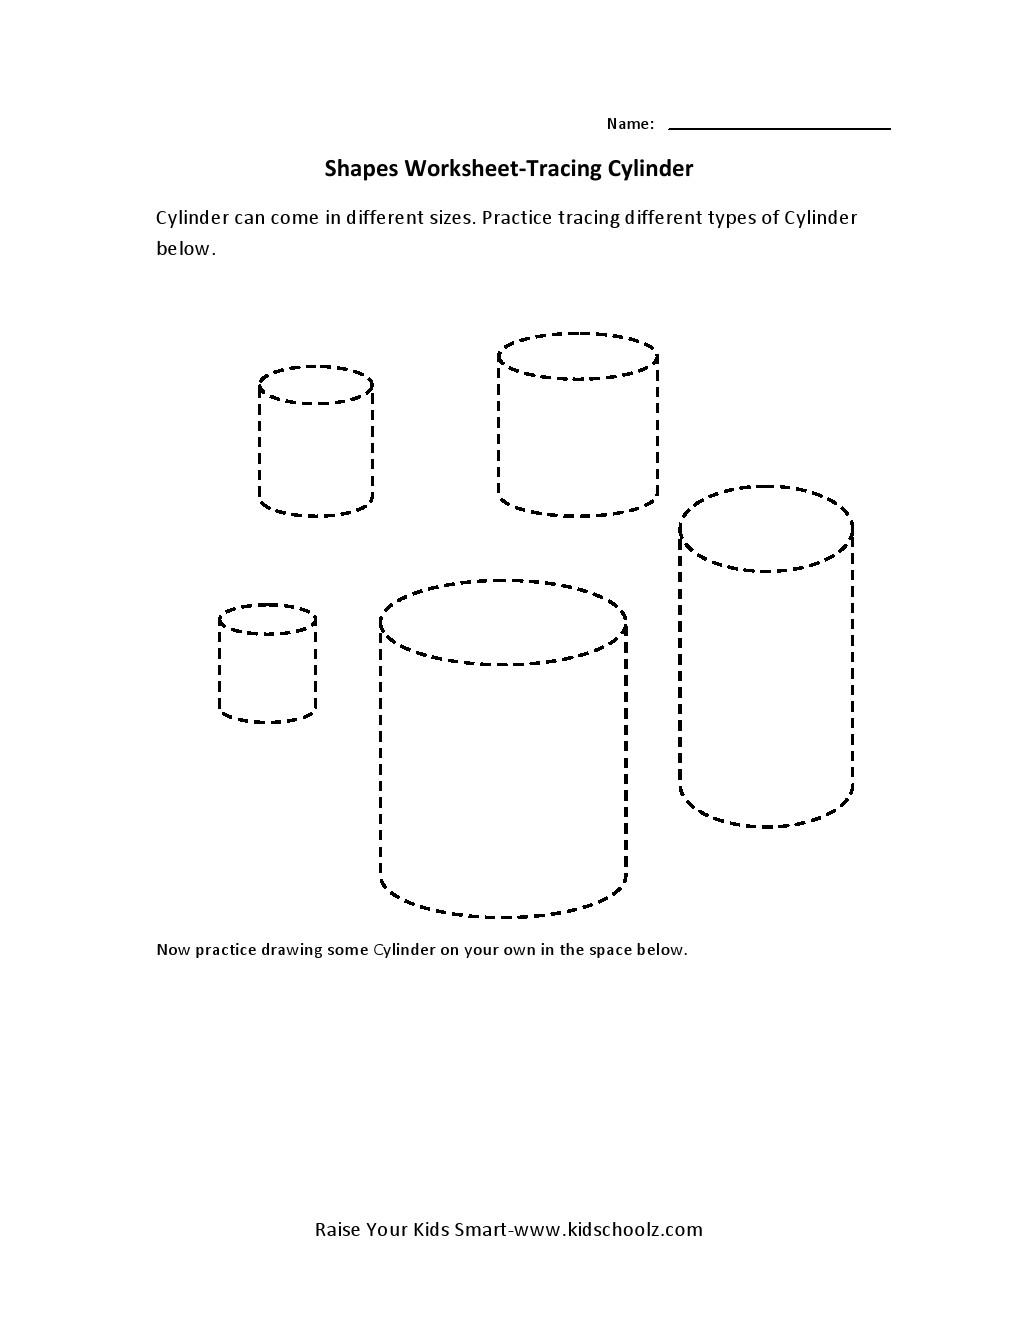 Workbooks shapes tracing worksheets preschool : Tracing Worksheets - Cylinder - Kidschoolz